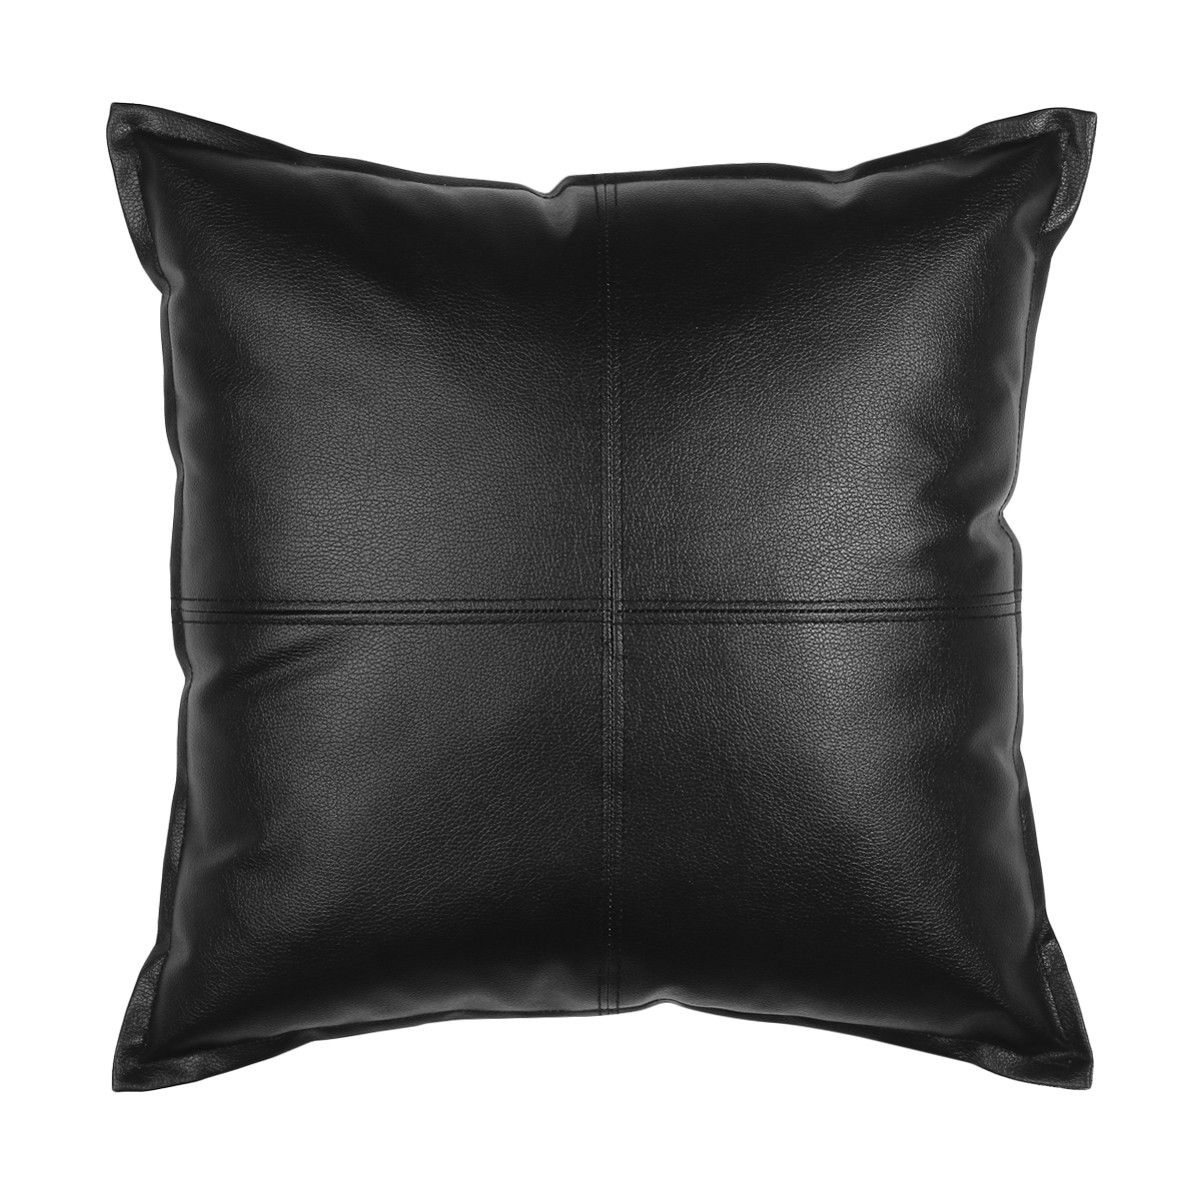 Harley Cushion Black Kmart Kmart decor, Leather